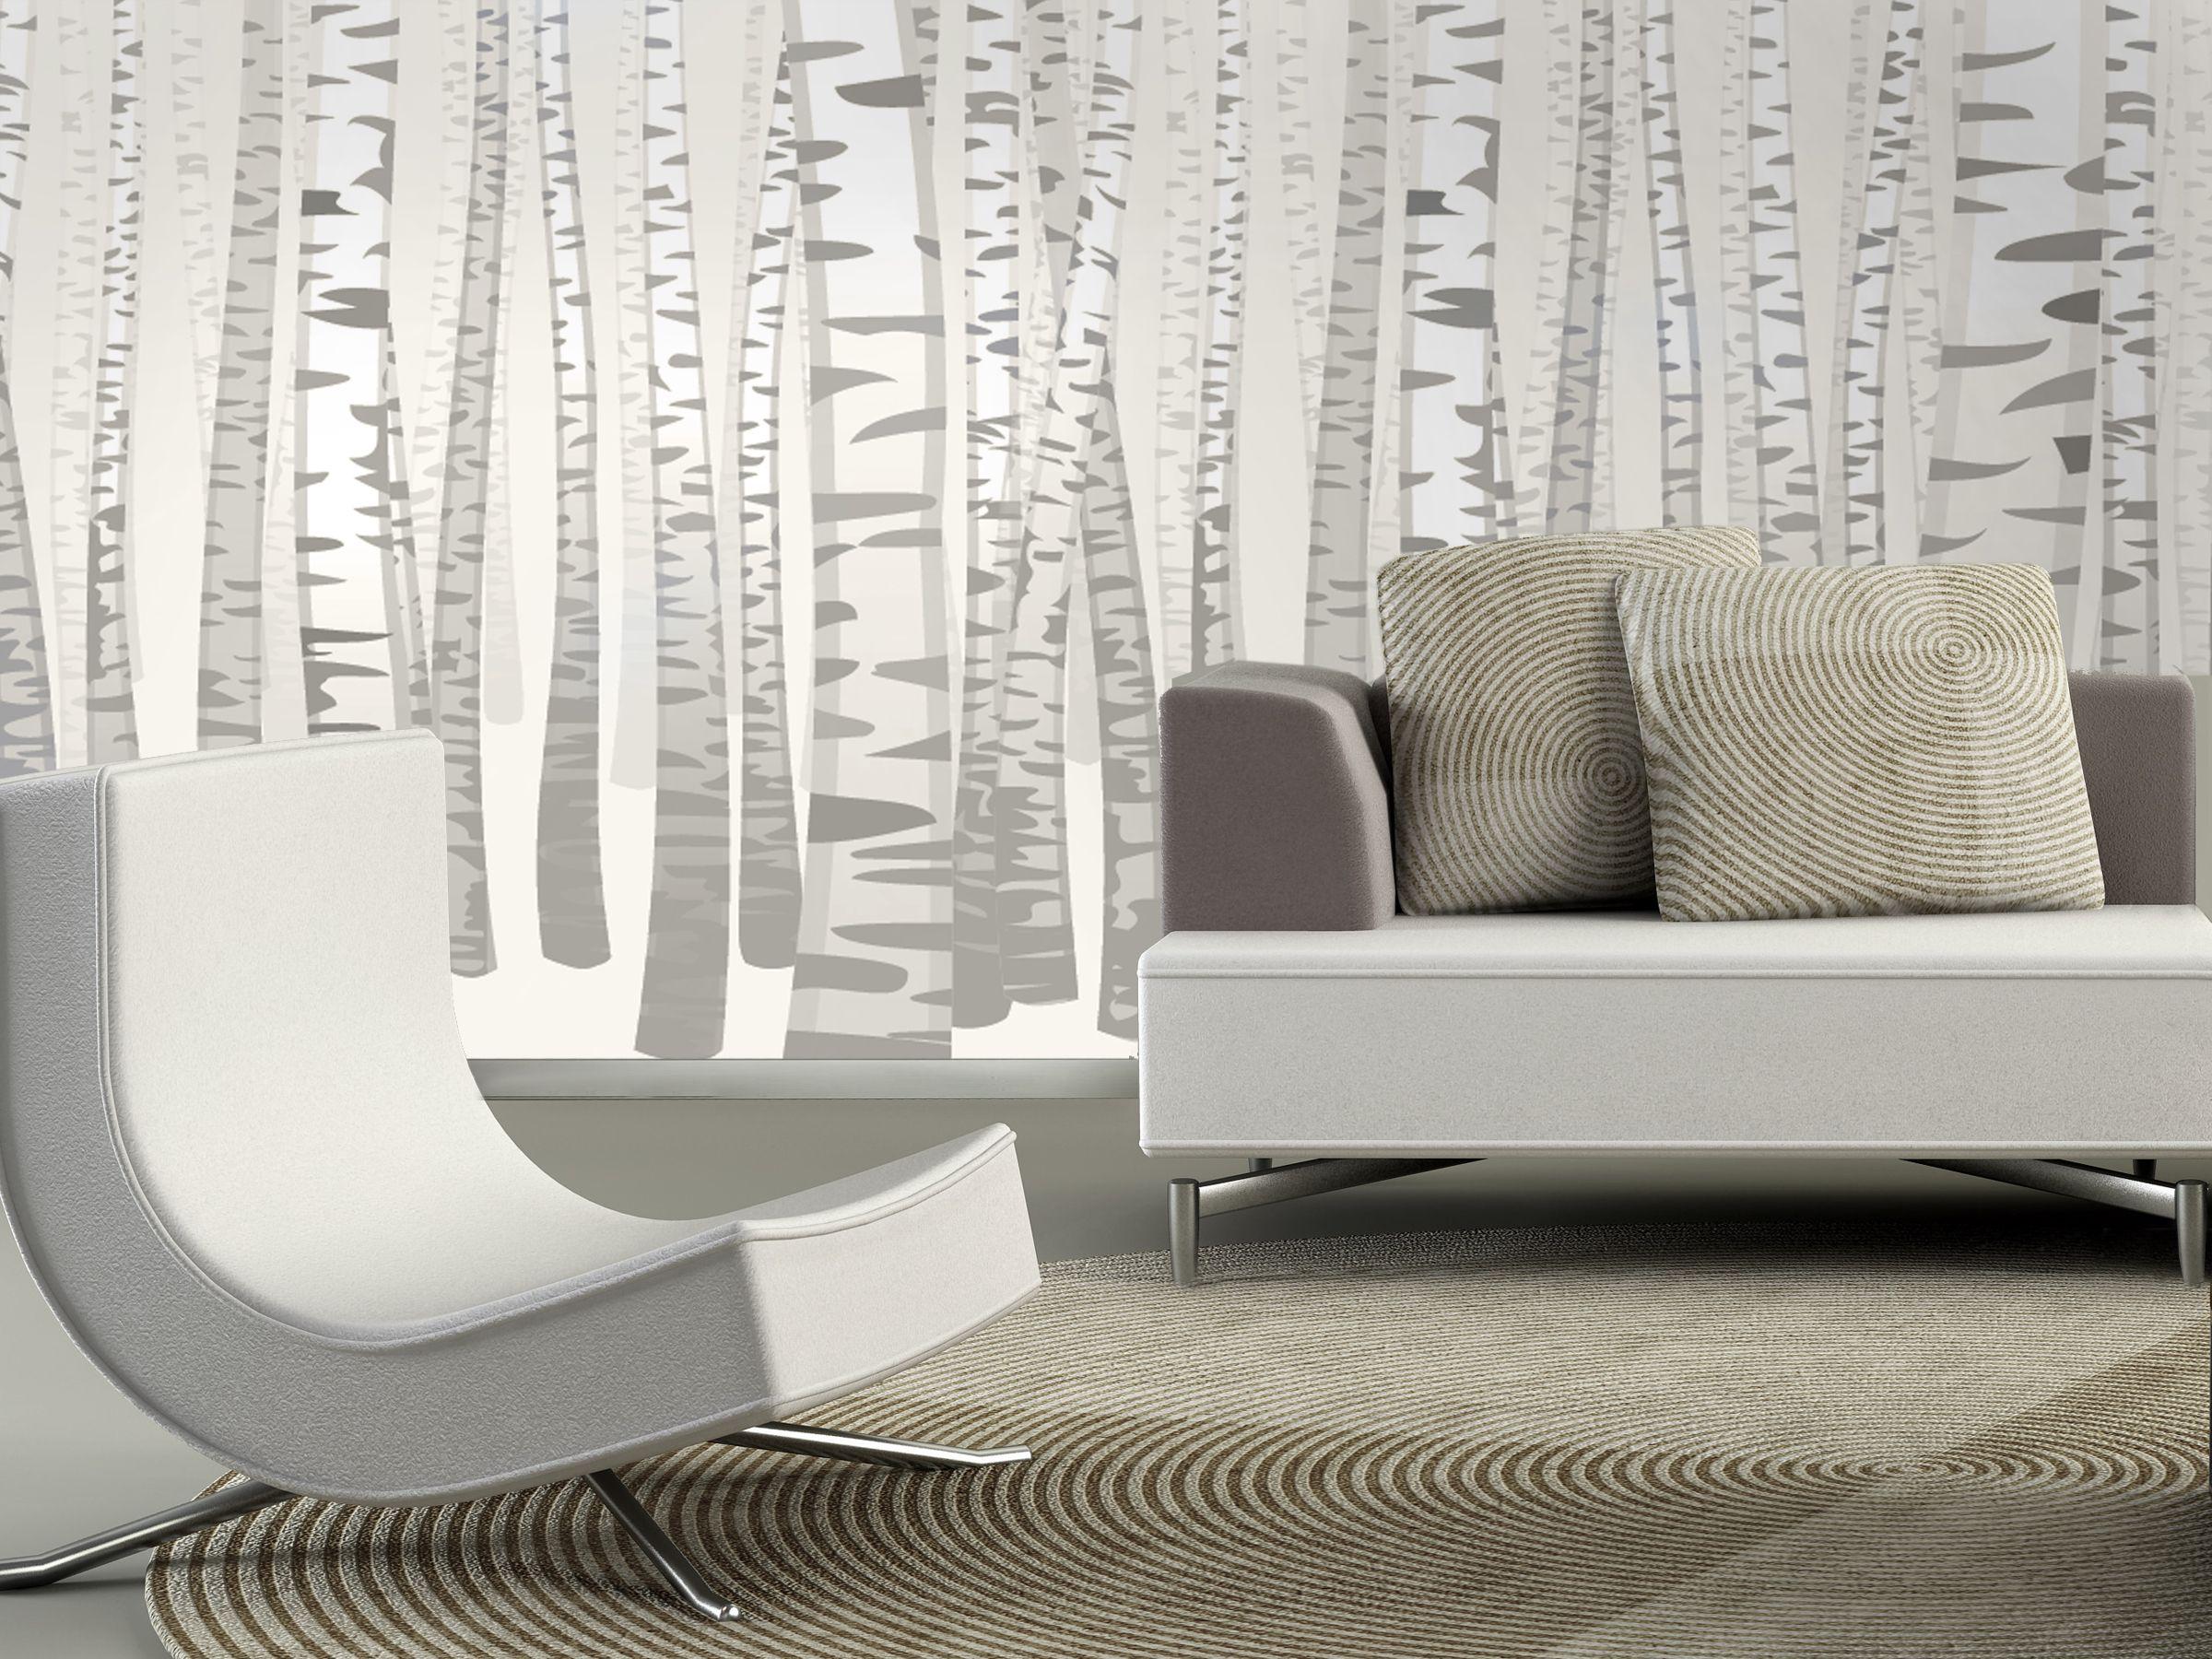 Zig Zag Tree Wallpaper Home Decor Interior Decorating Wall